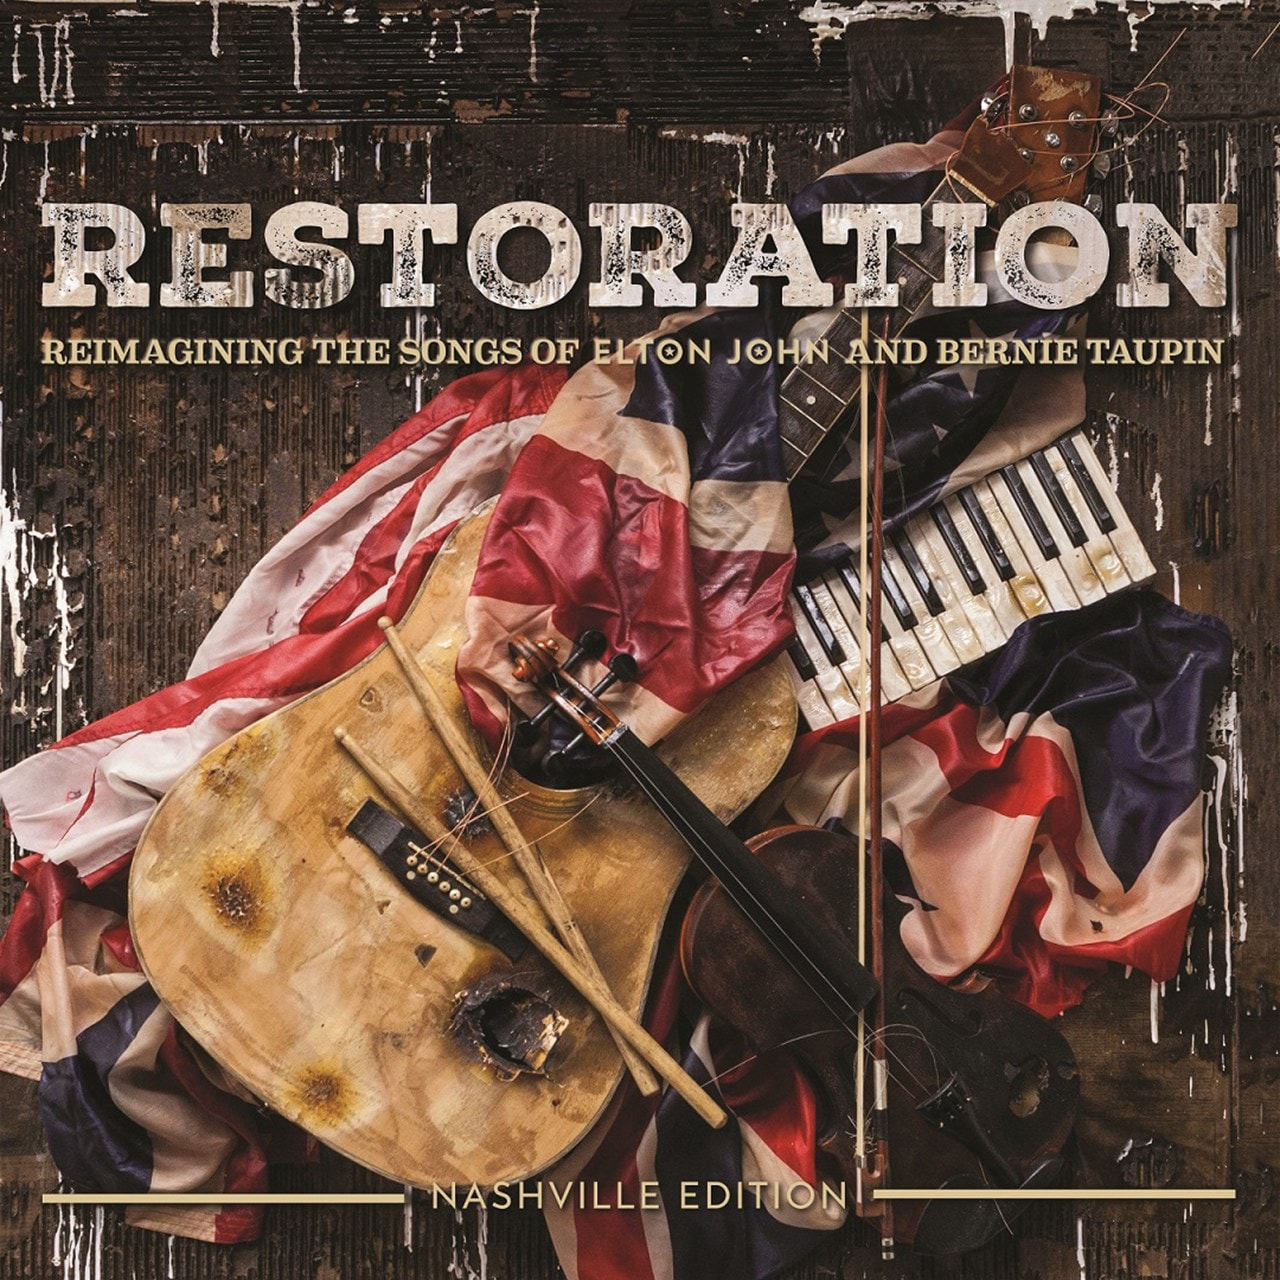 Restoration: Reimagining the Songs of Elton John & Bernie Taupin - 2